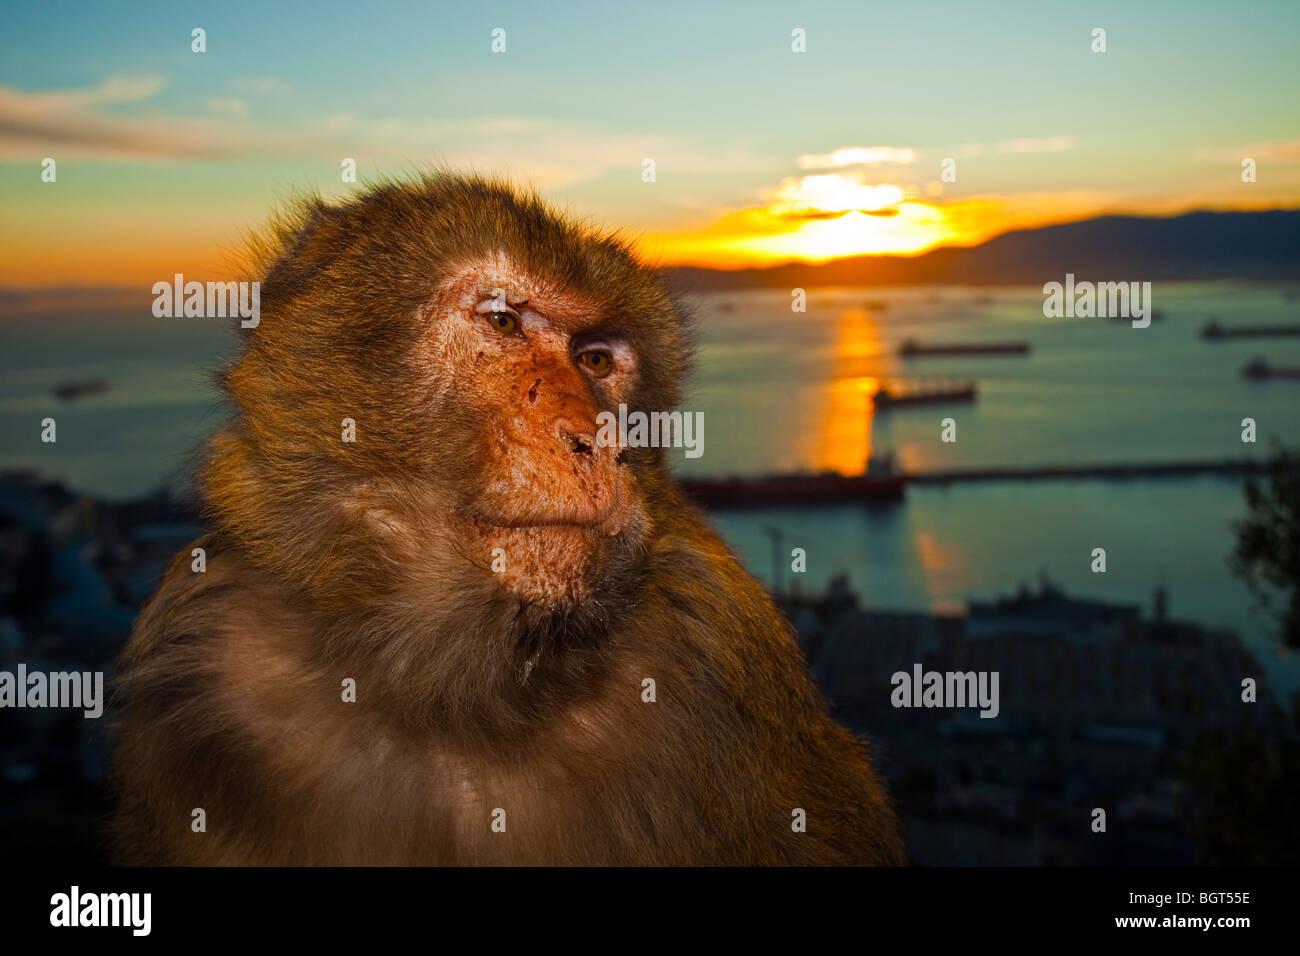 Barbary Ape (Macaca sylvanus), Rock of Gibraltar, UK - Stock Image